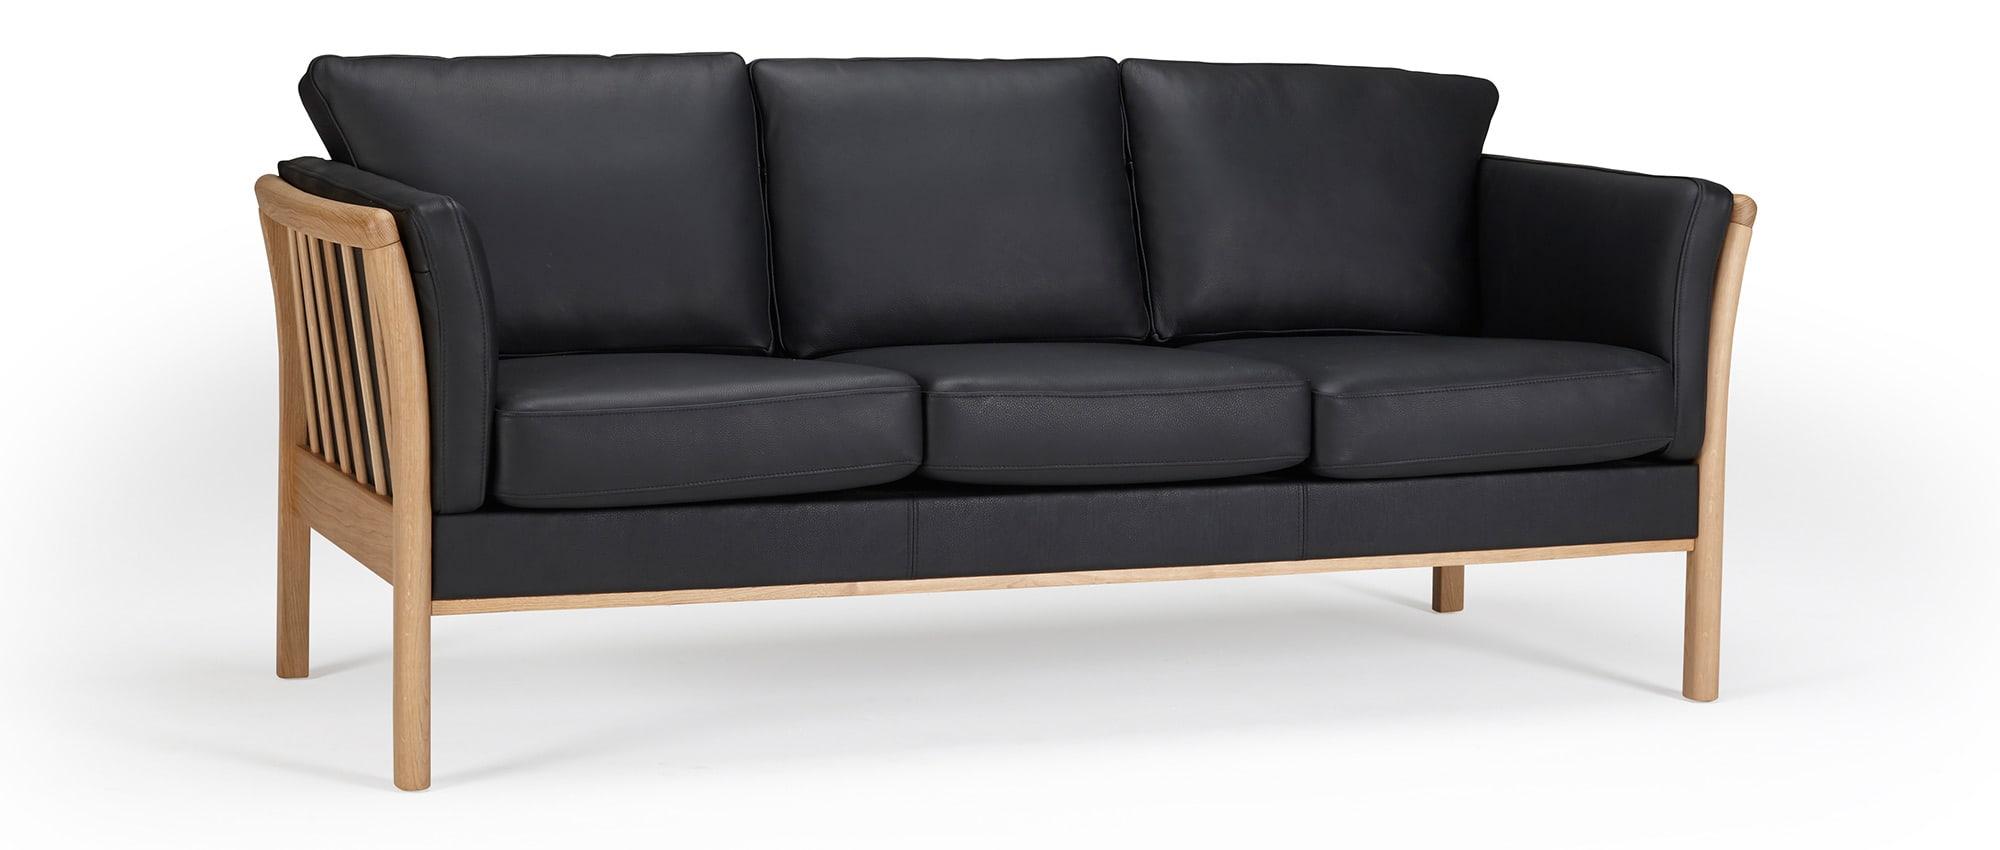 designer sofa stockholm als 2 sitzer 3 sitzer und sessel mit holzarmlehnen. Black Bedroom Furniture Sets. Home Design Ideas